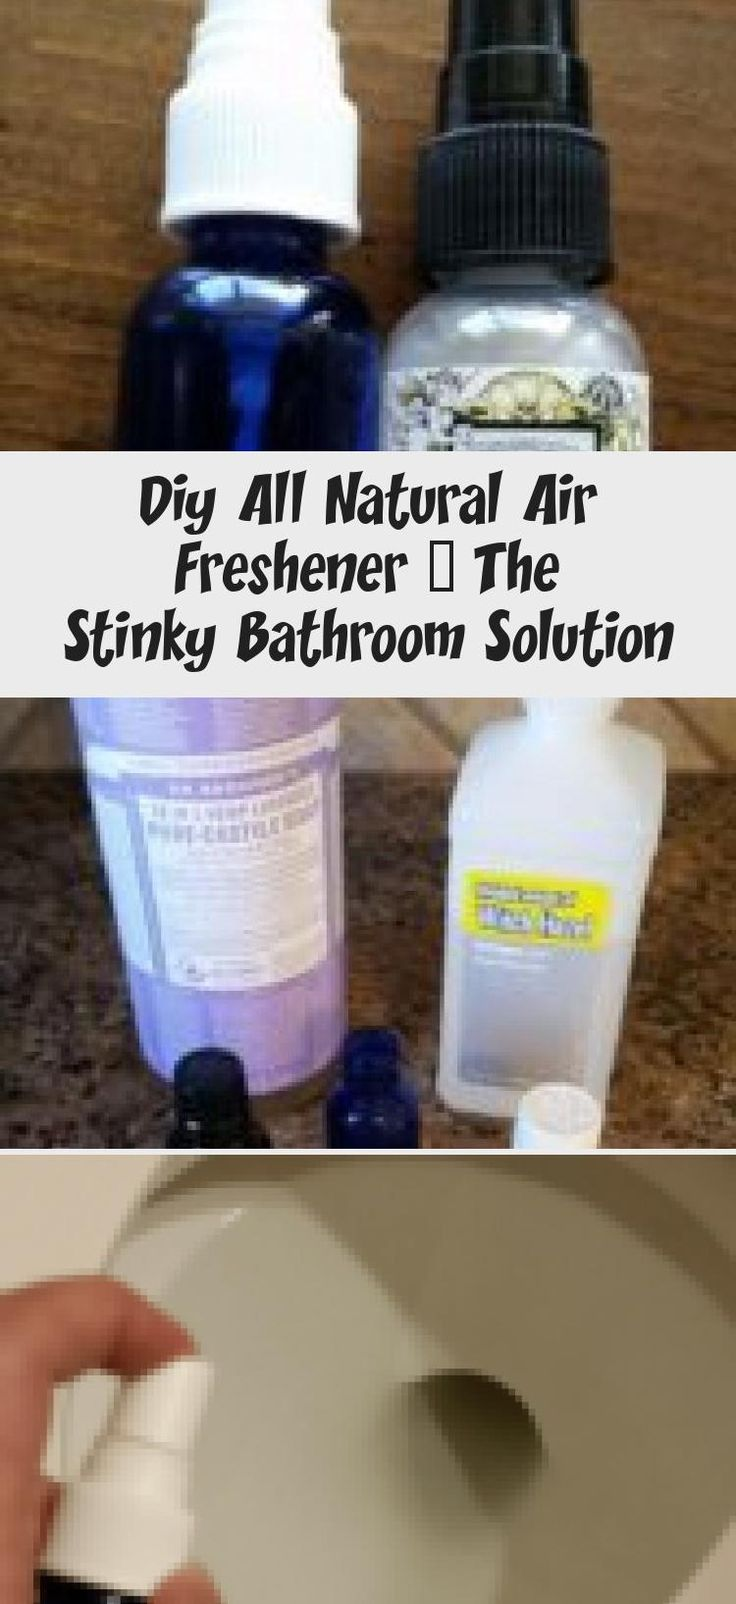 Diy All Natural Air Freshener The Stinky Bathroom